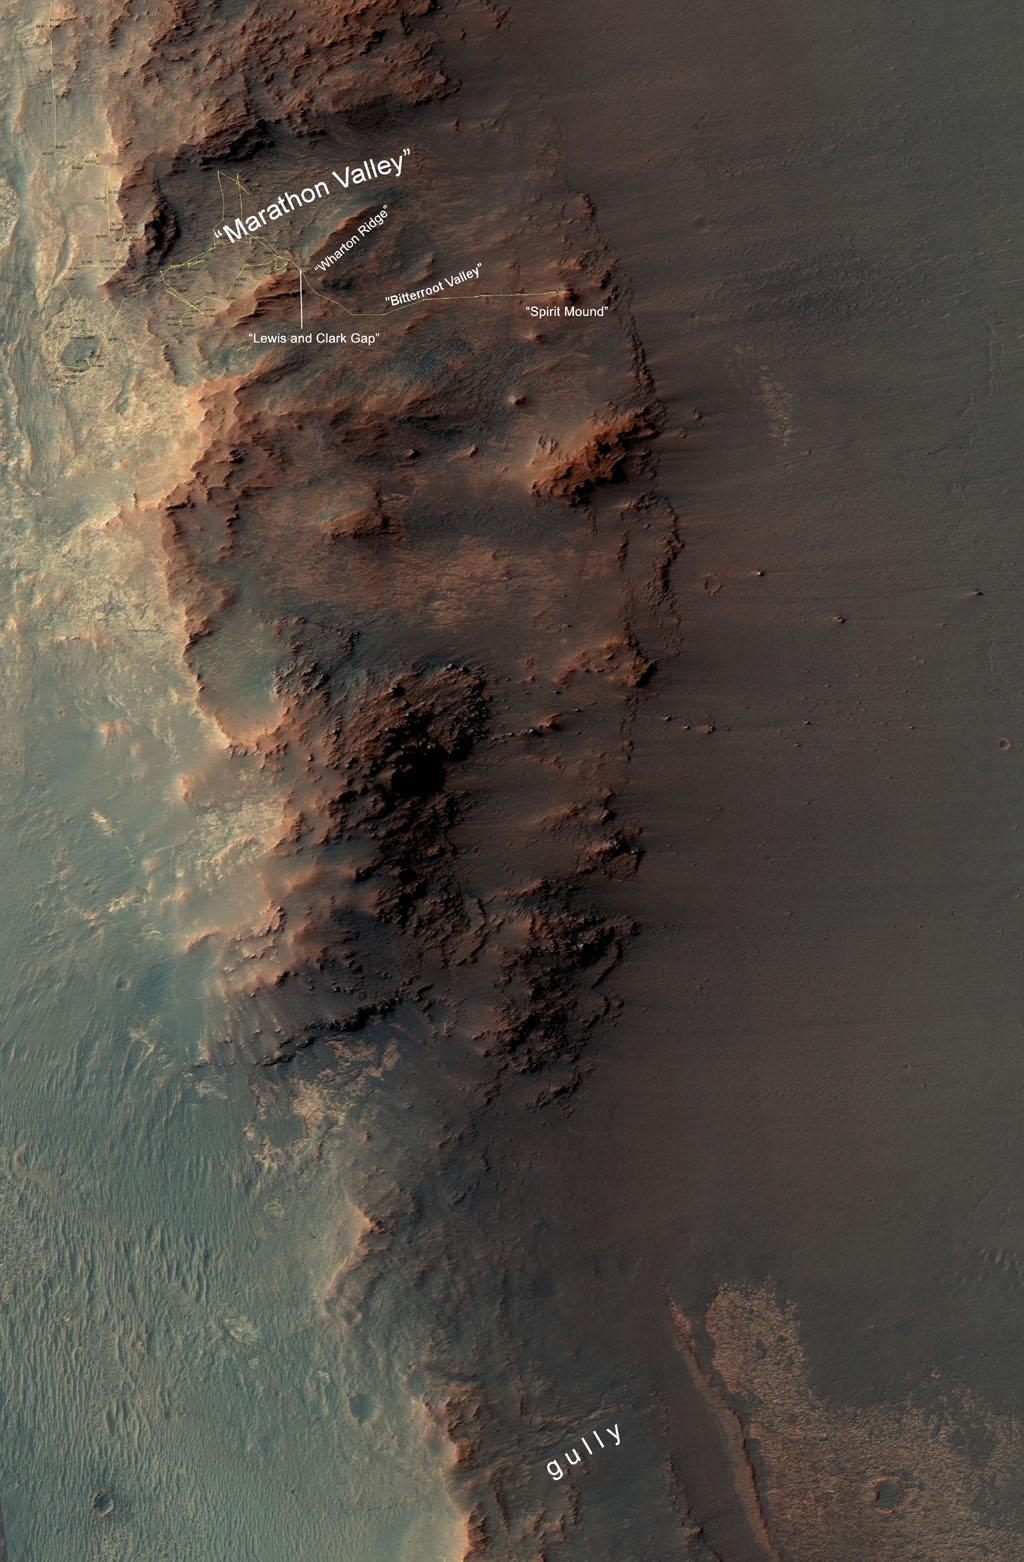 mars rover twitter - photo #5